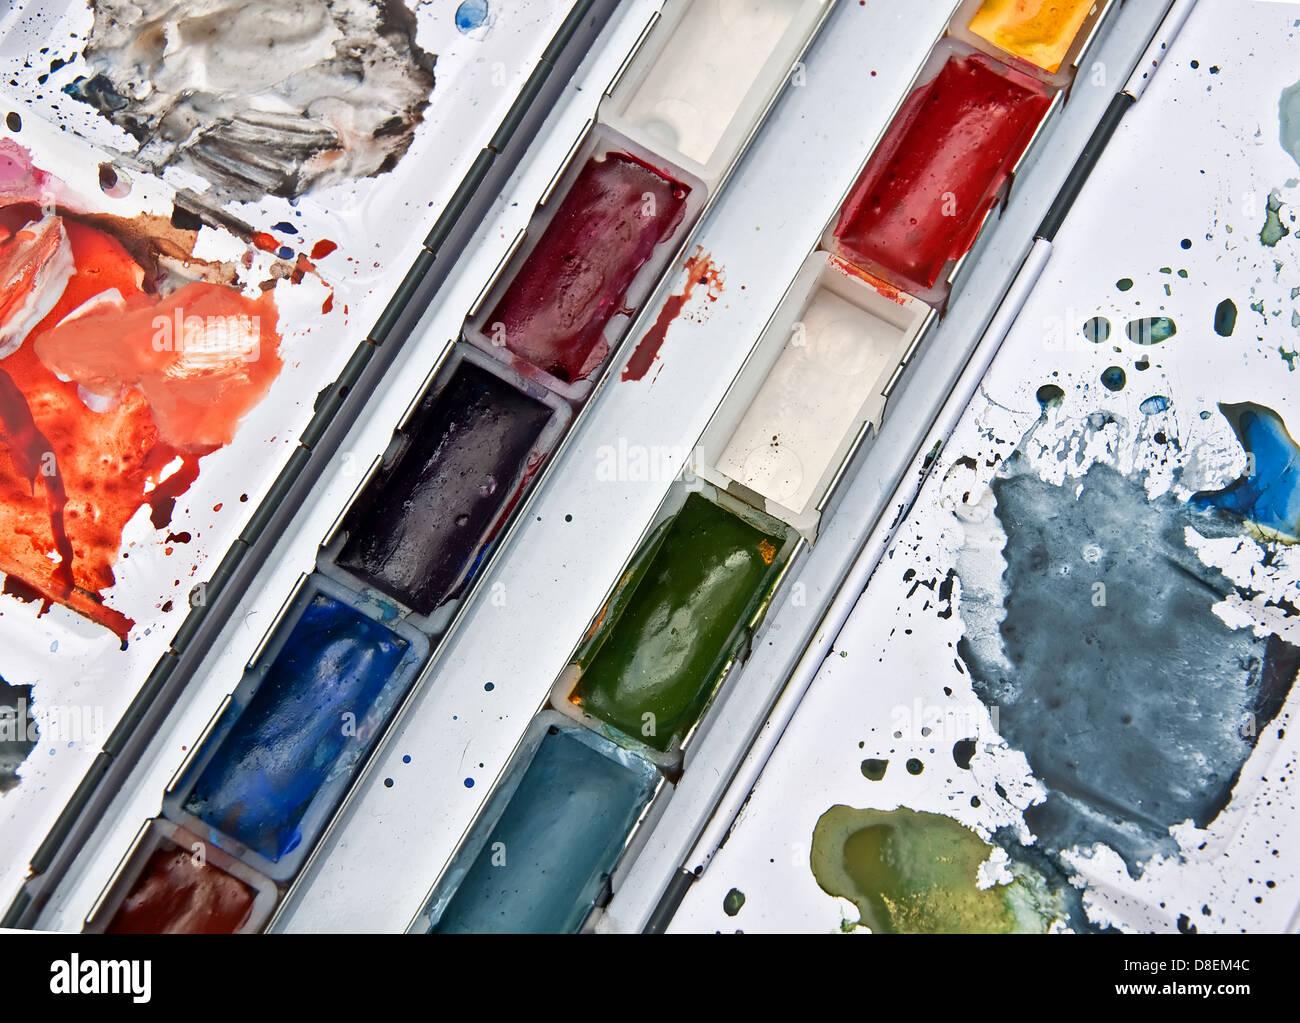 Artist Watercolor Paint Pallet Paint Palette Mixing Plate Pigment Tray Tools